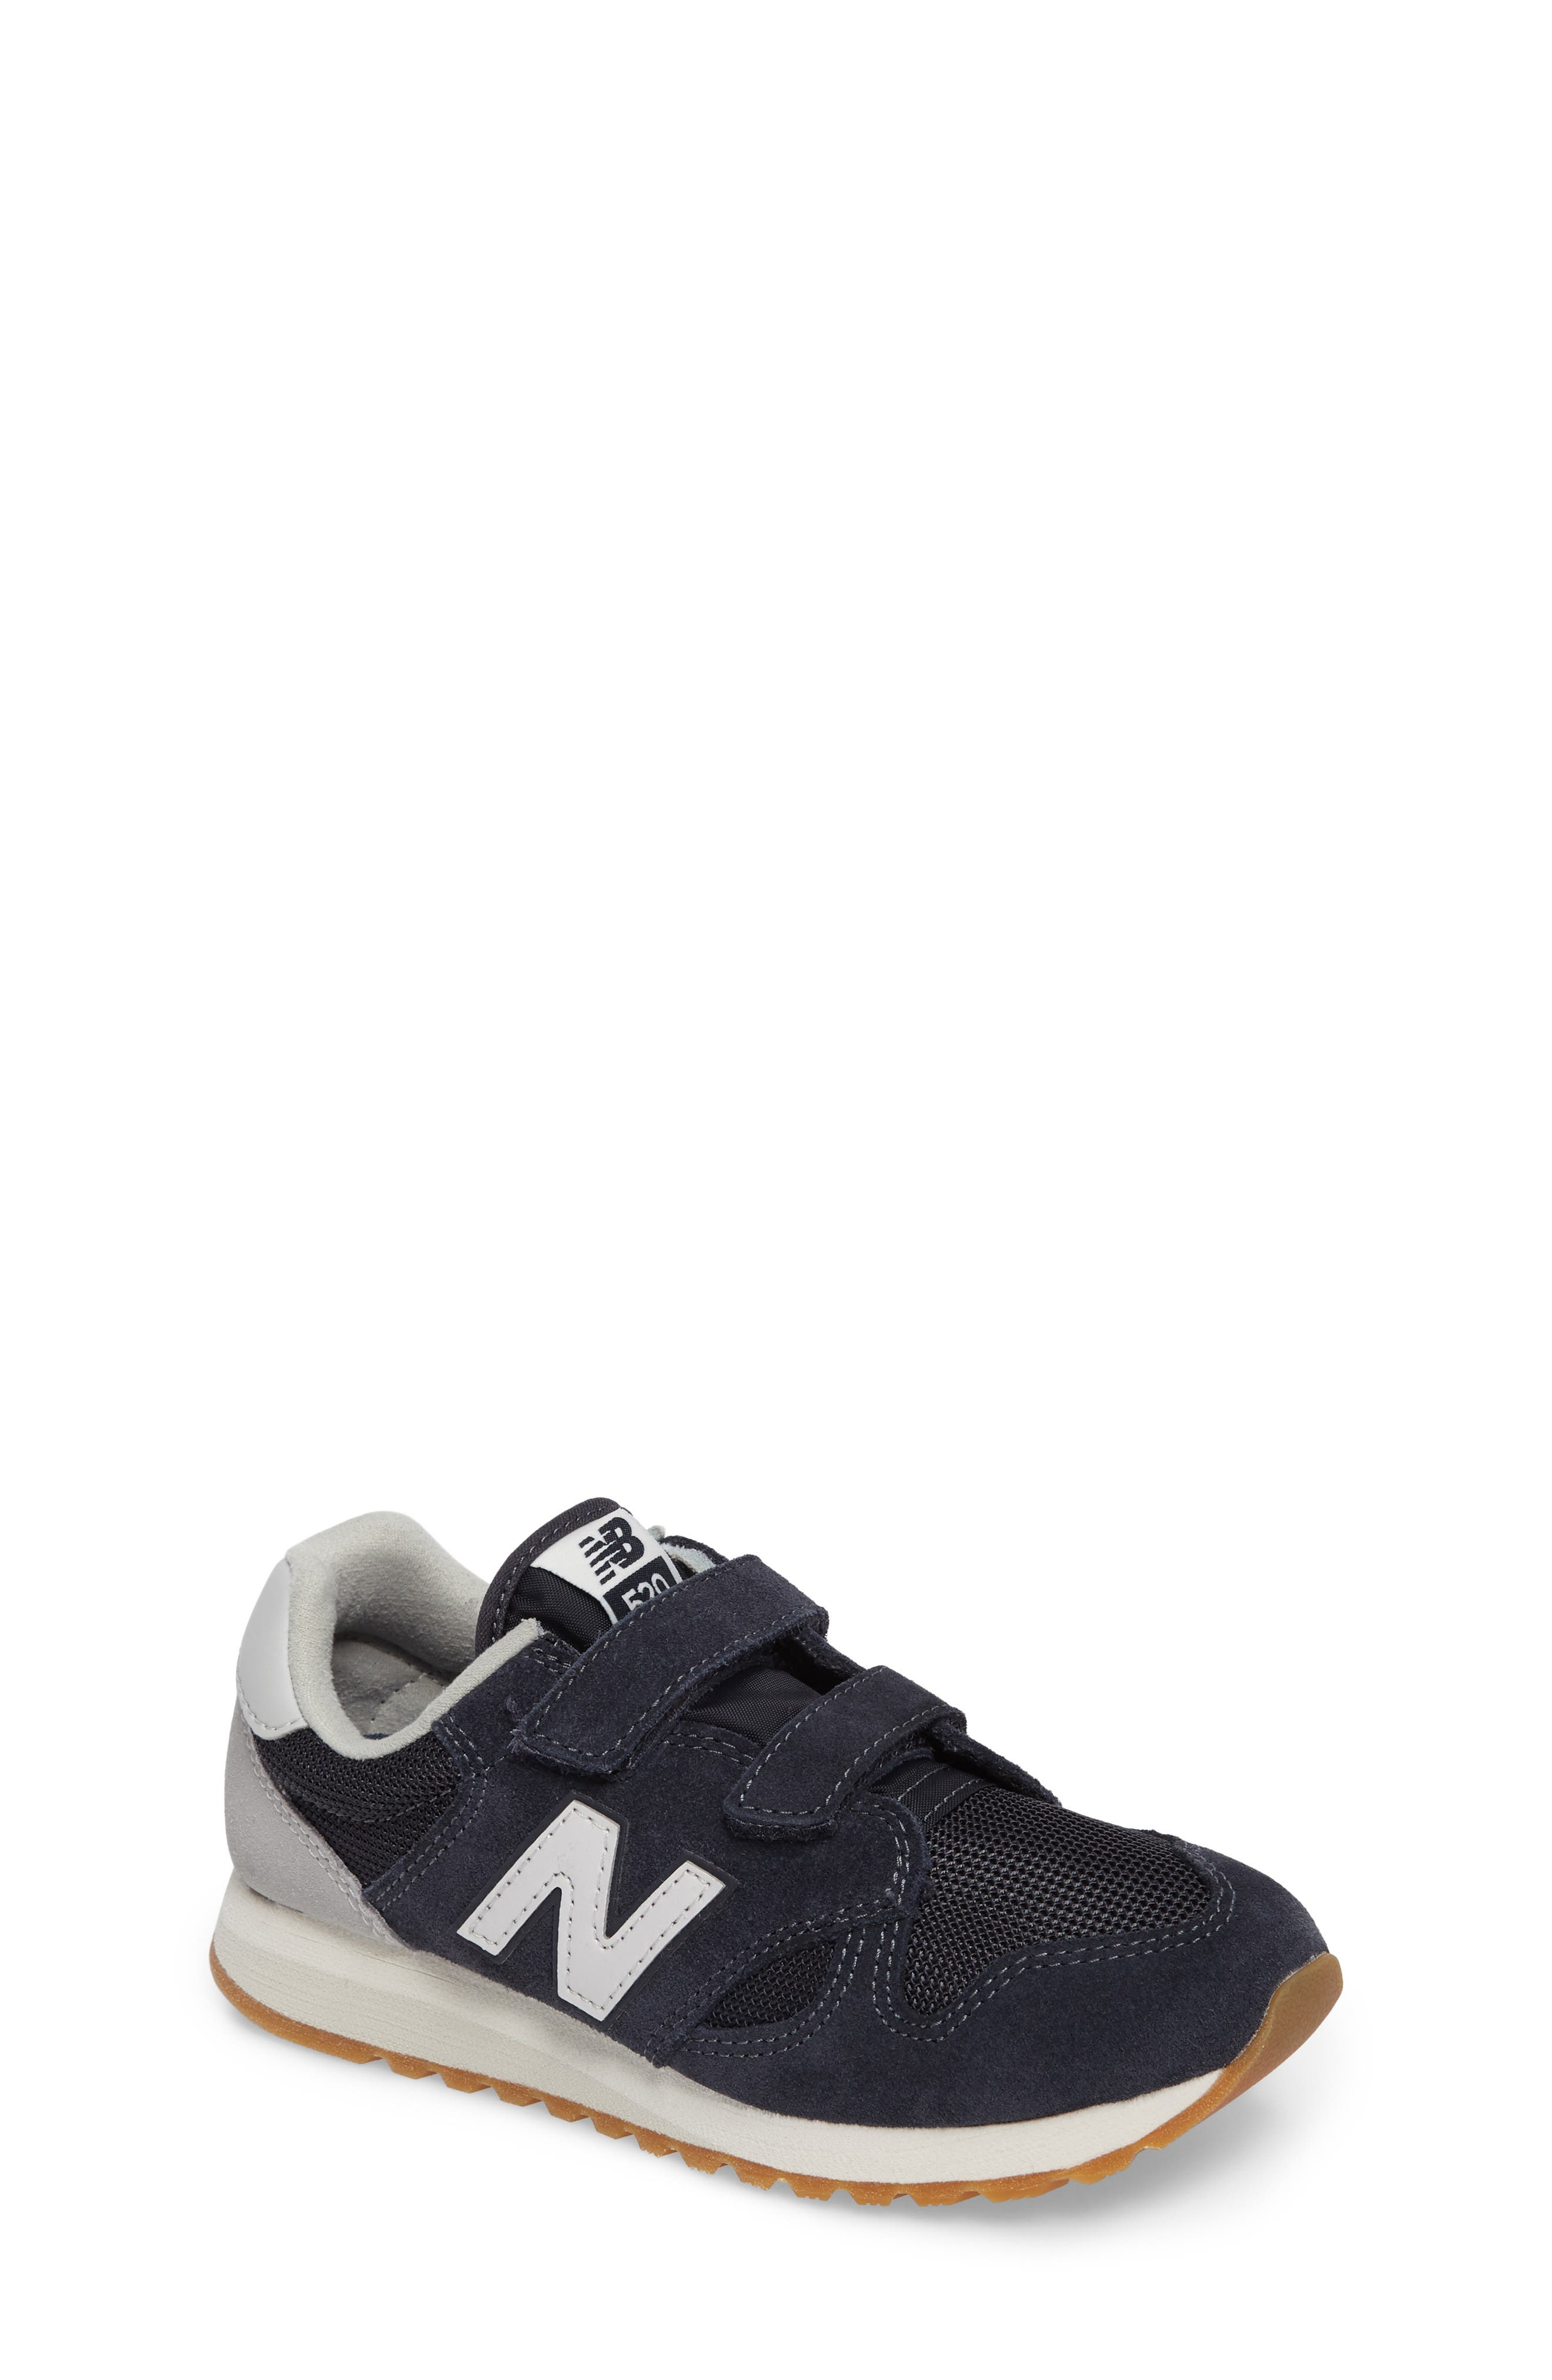 New Balance 520 Sneaker (Baby, Walker, Toddler & Little Kid)